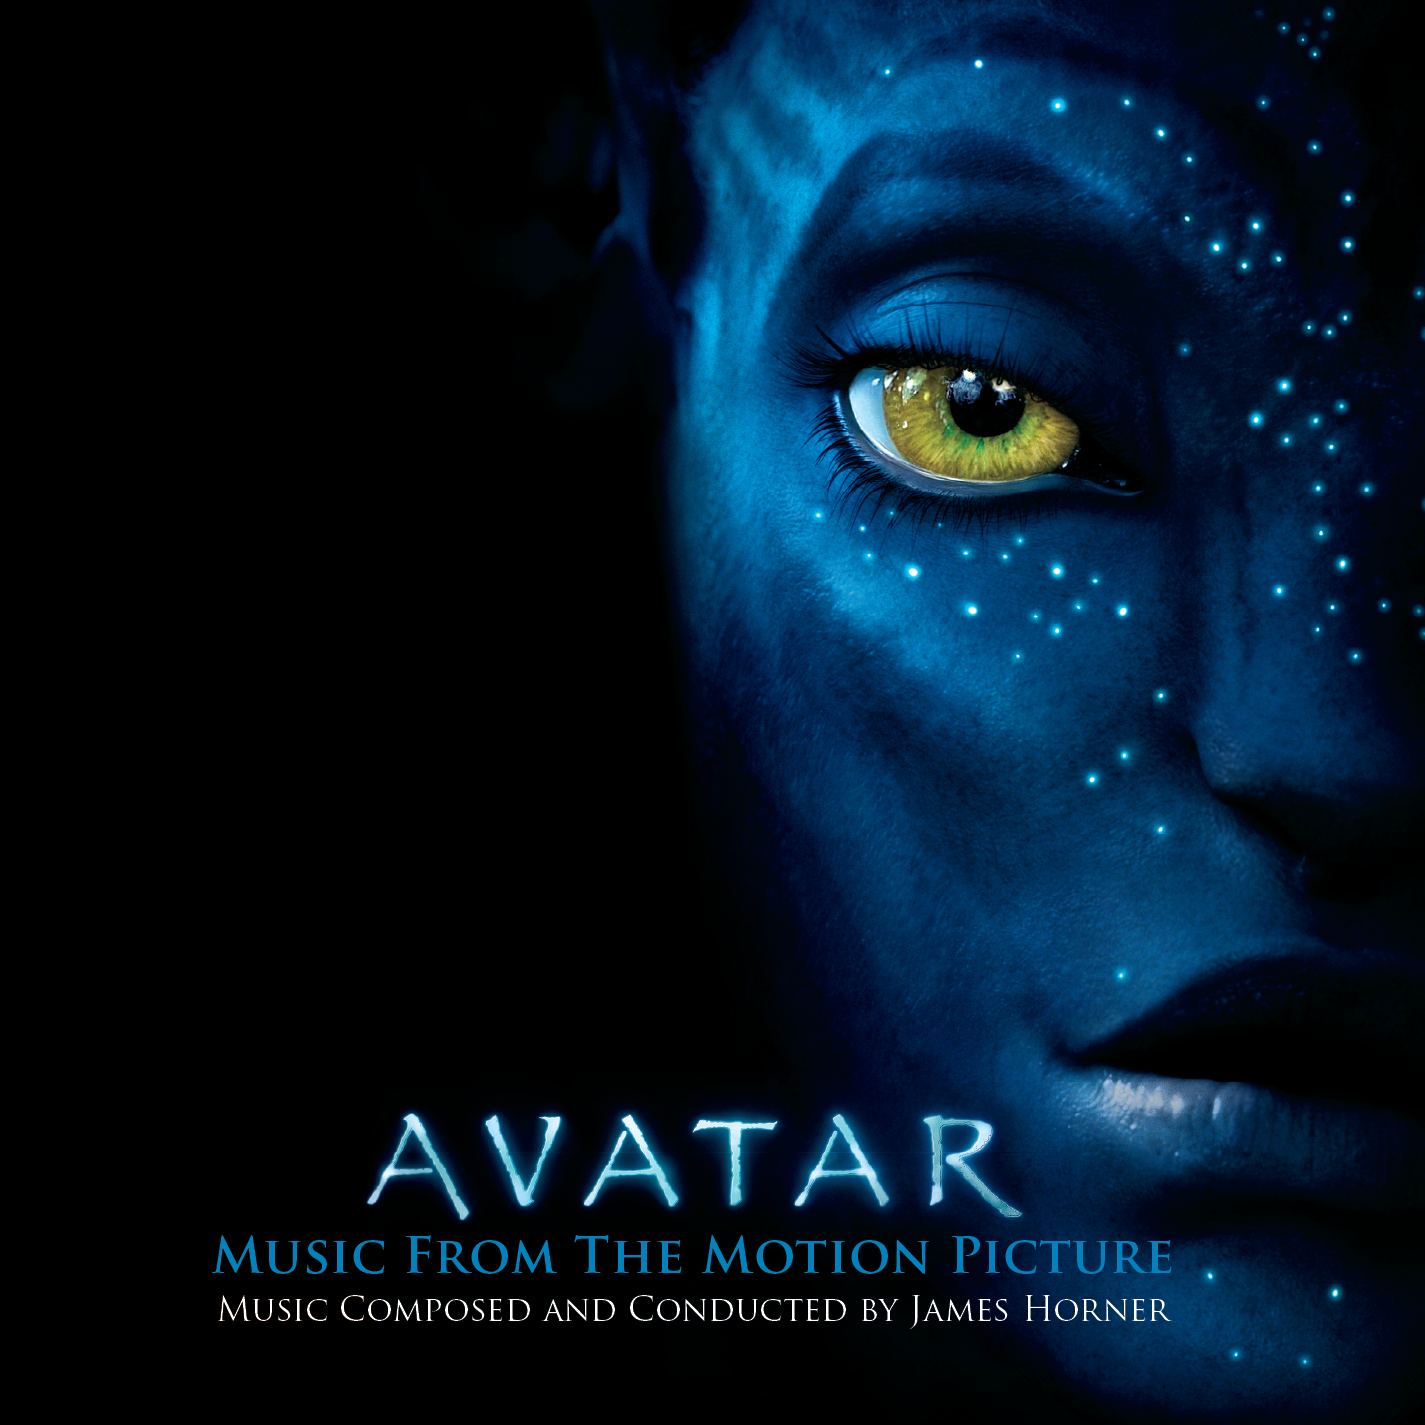 http://2.bp.blogspot.com/-JDndrVqRovE/TWgqpbAz-6I/AAAAAAAAADk/fBouEBLbepQ/s1600/Soundtrack-Avatar1.jpg